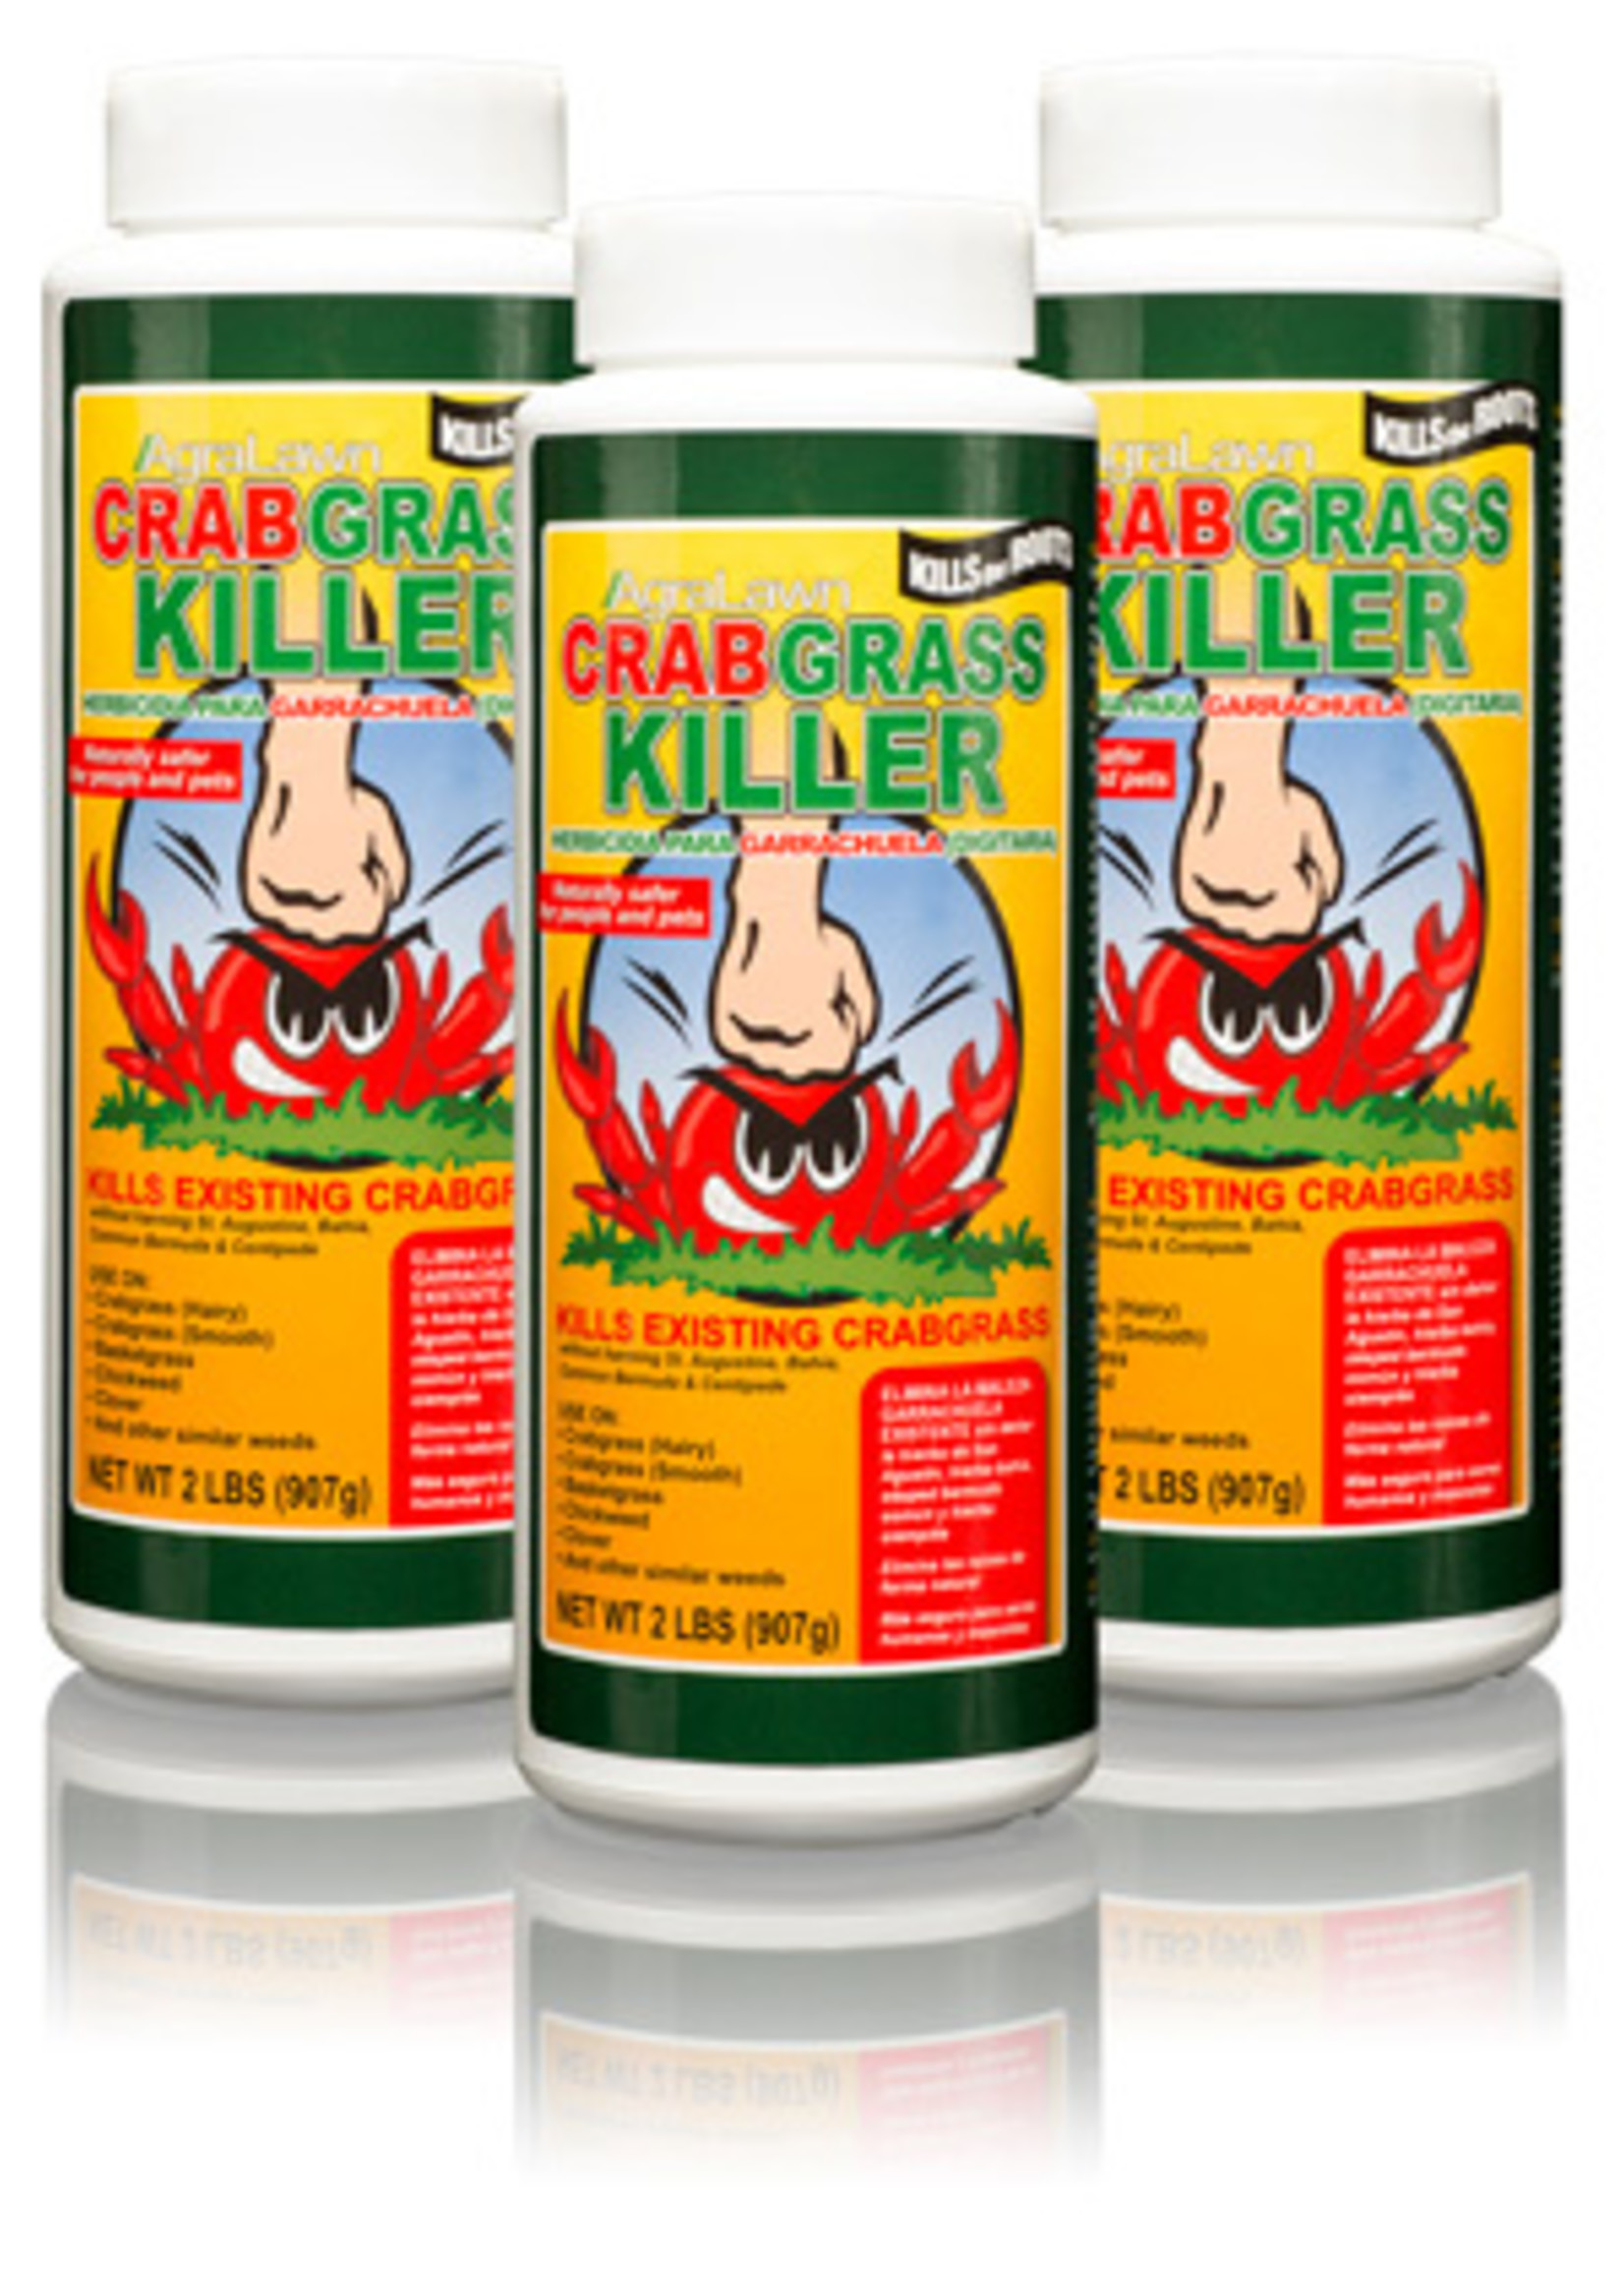 Agralawn CrabGrass Killer 2 lbs.